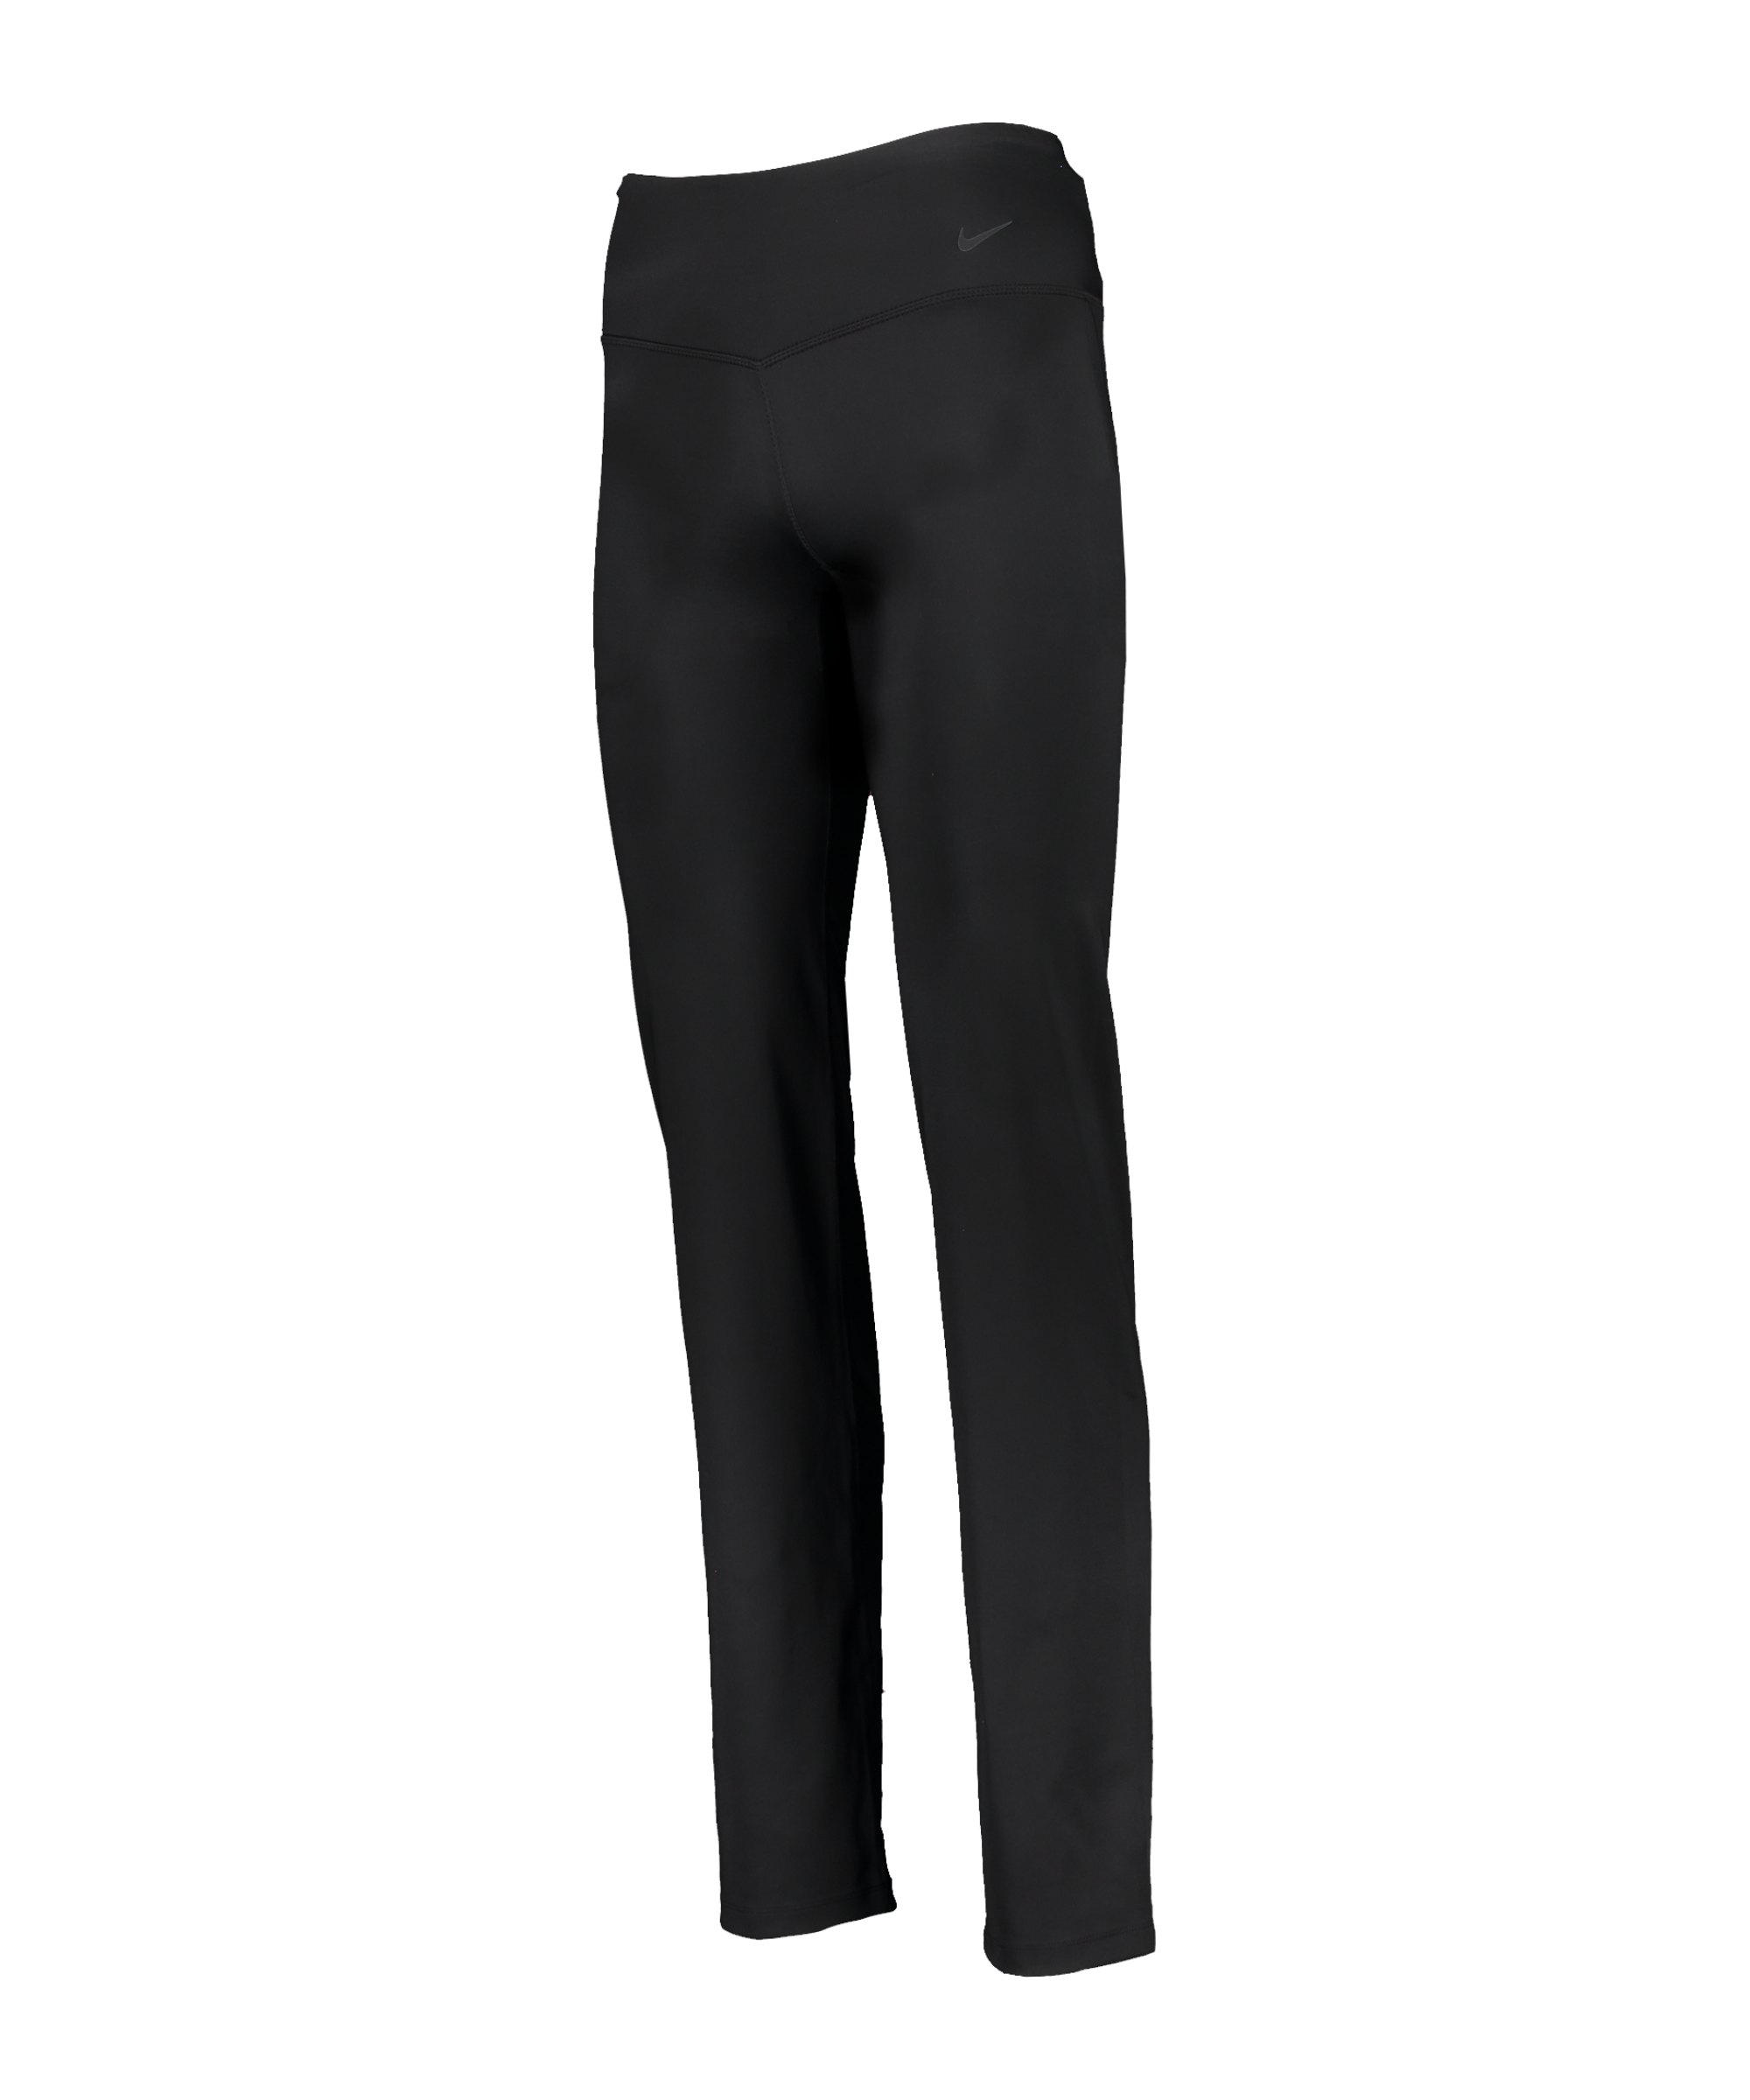 Nike Classic Power Jogginghose Damen F010 - schwarz